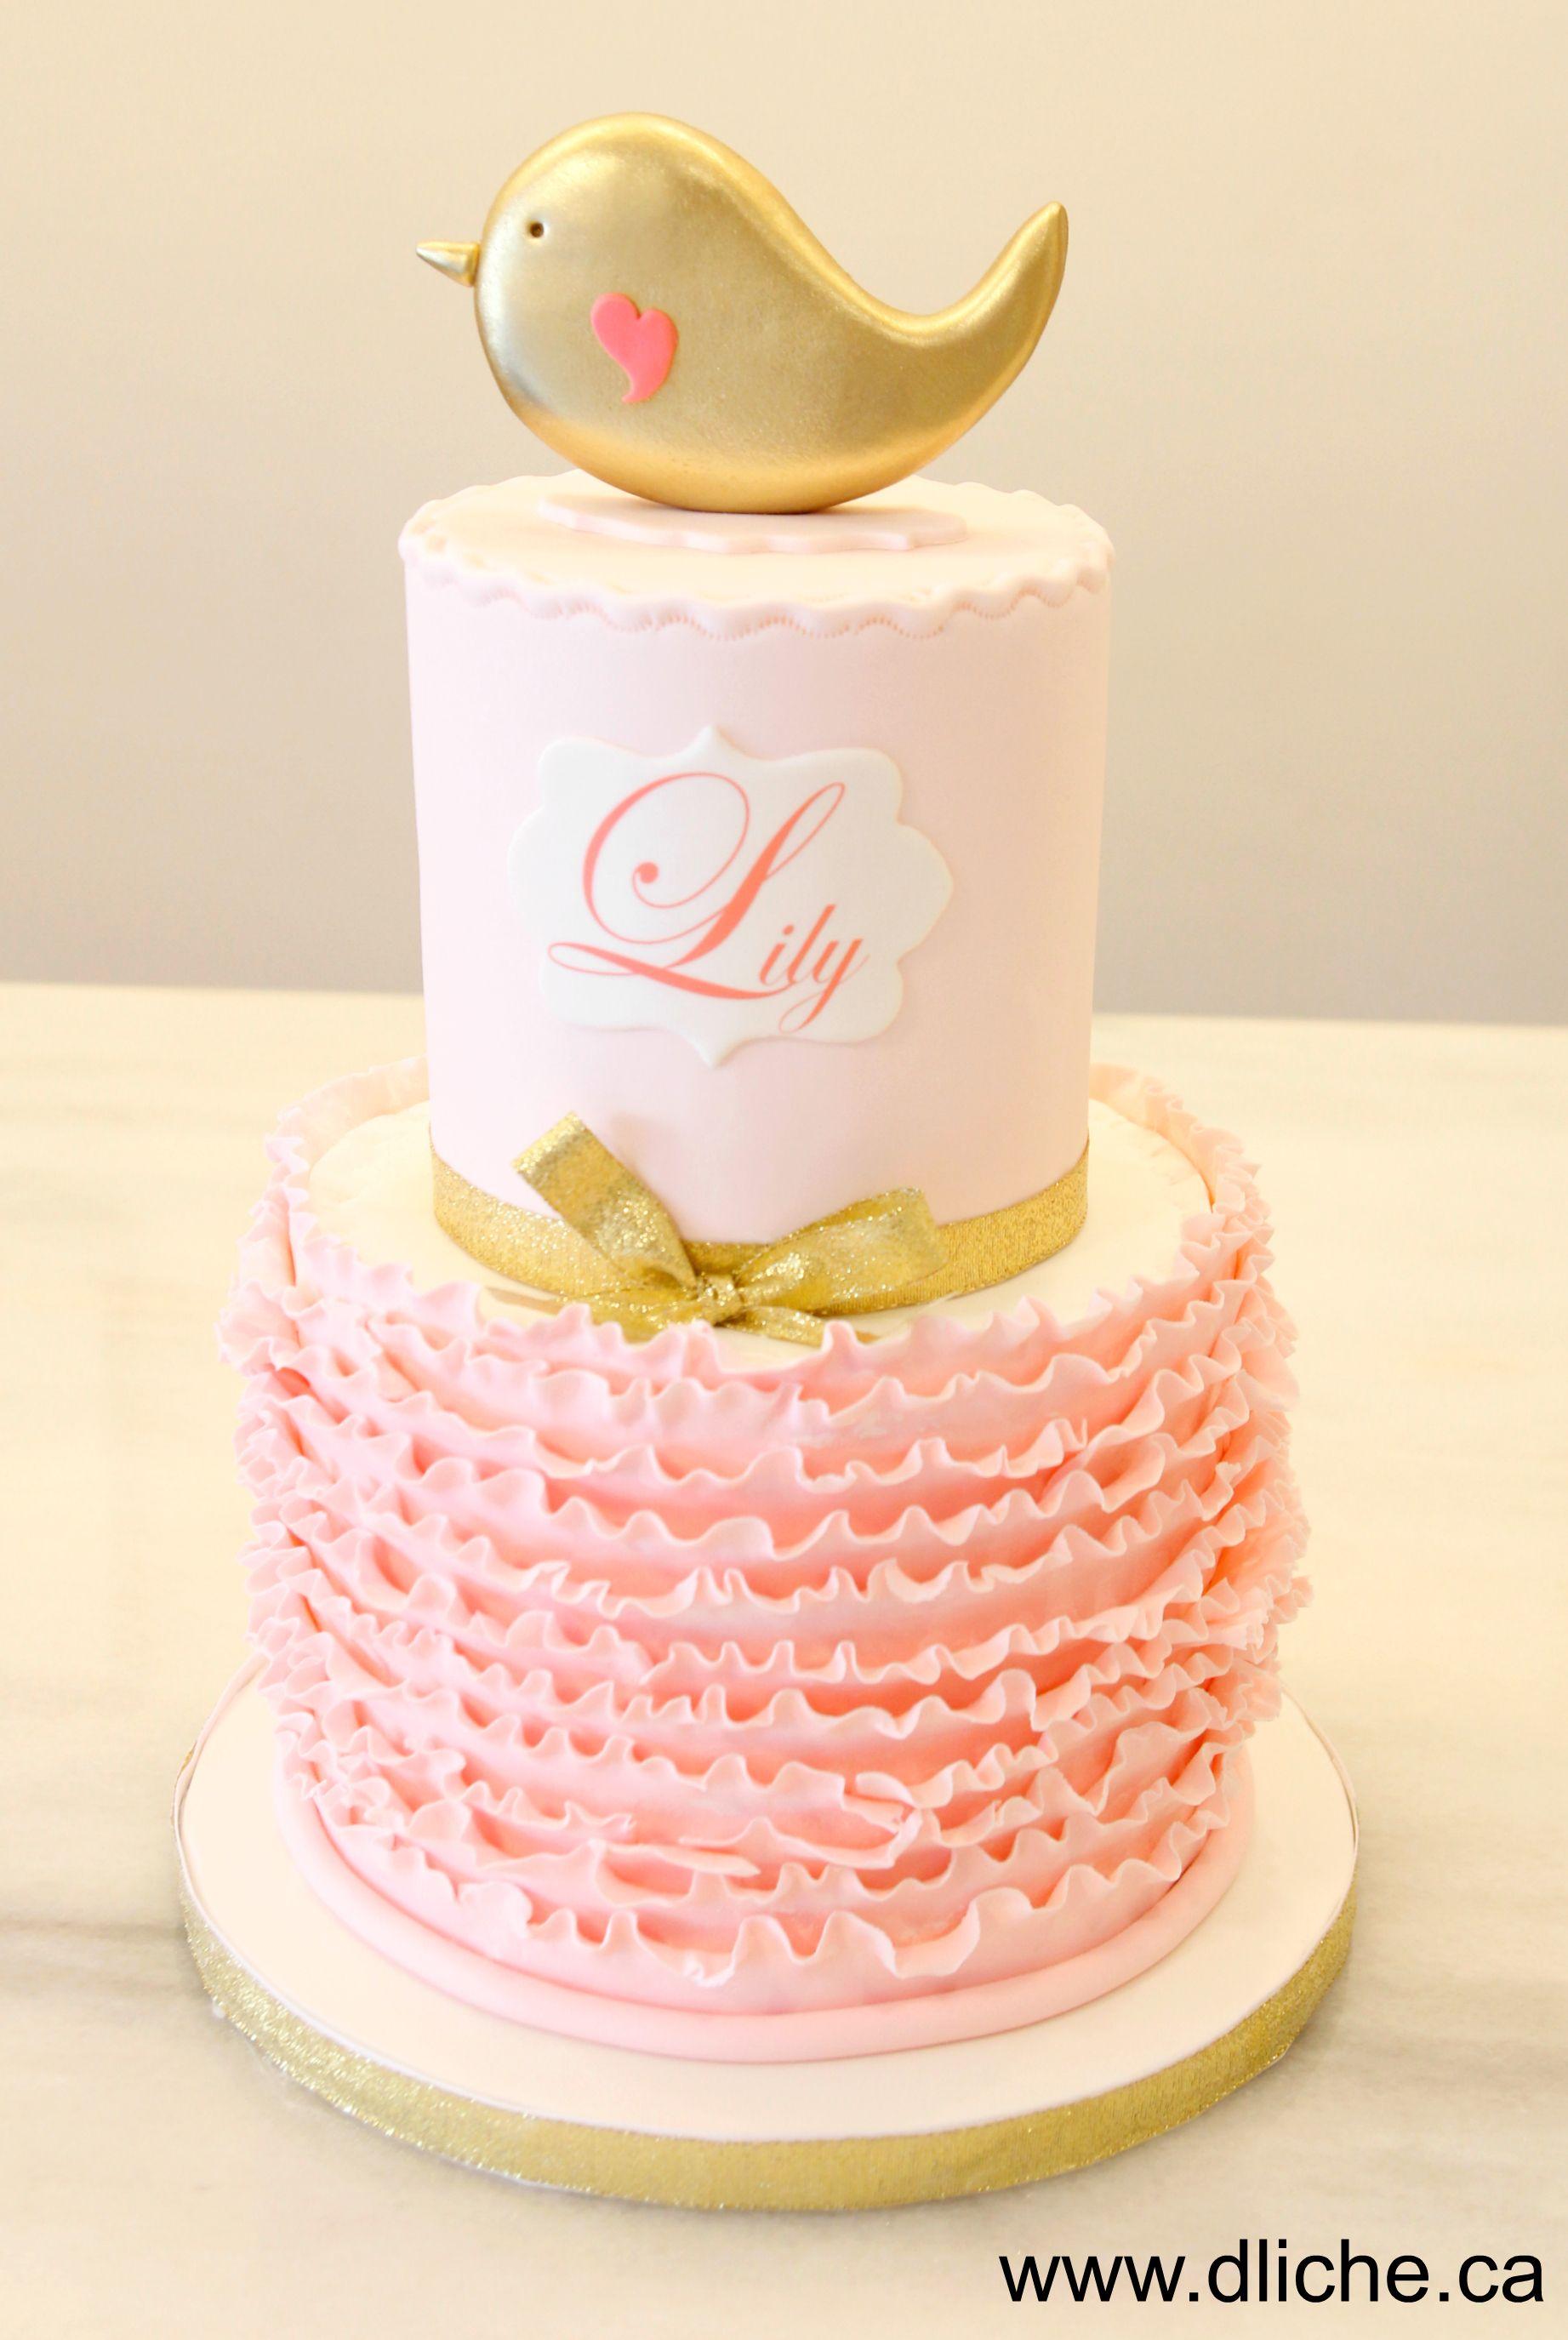 Un g¢teau rose et doré pour Lily A pink and gold cake for Lily